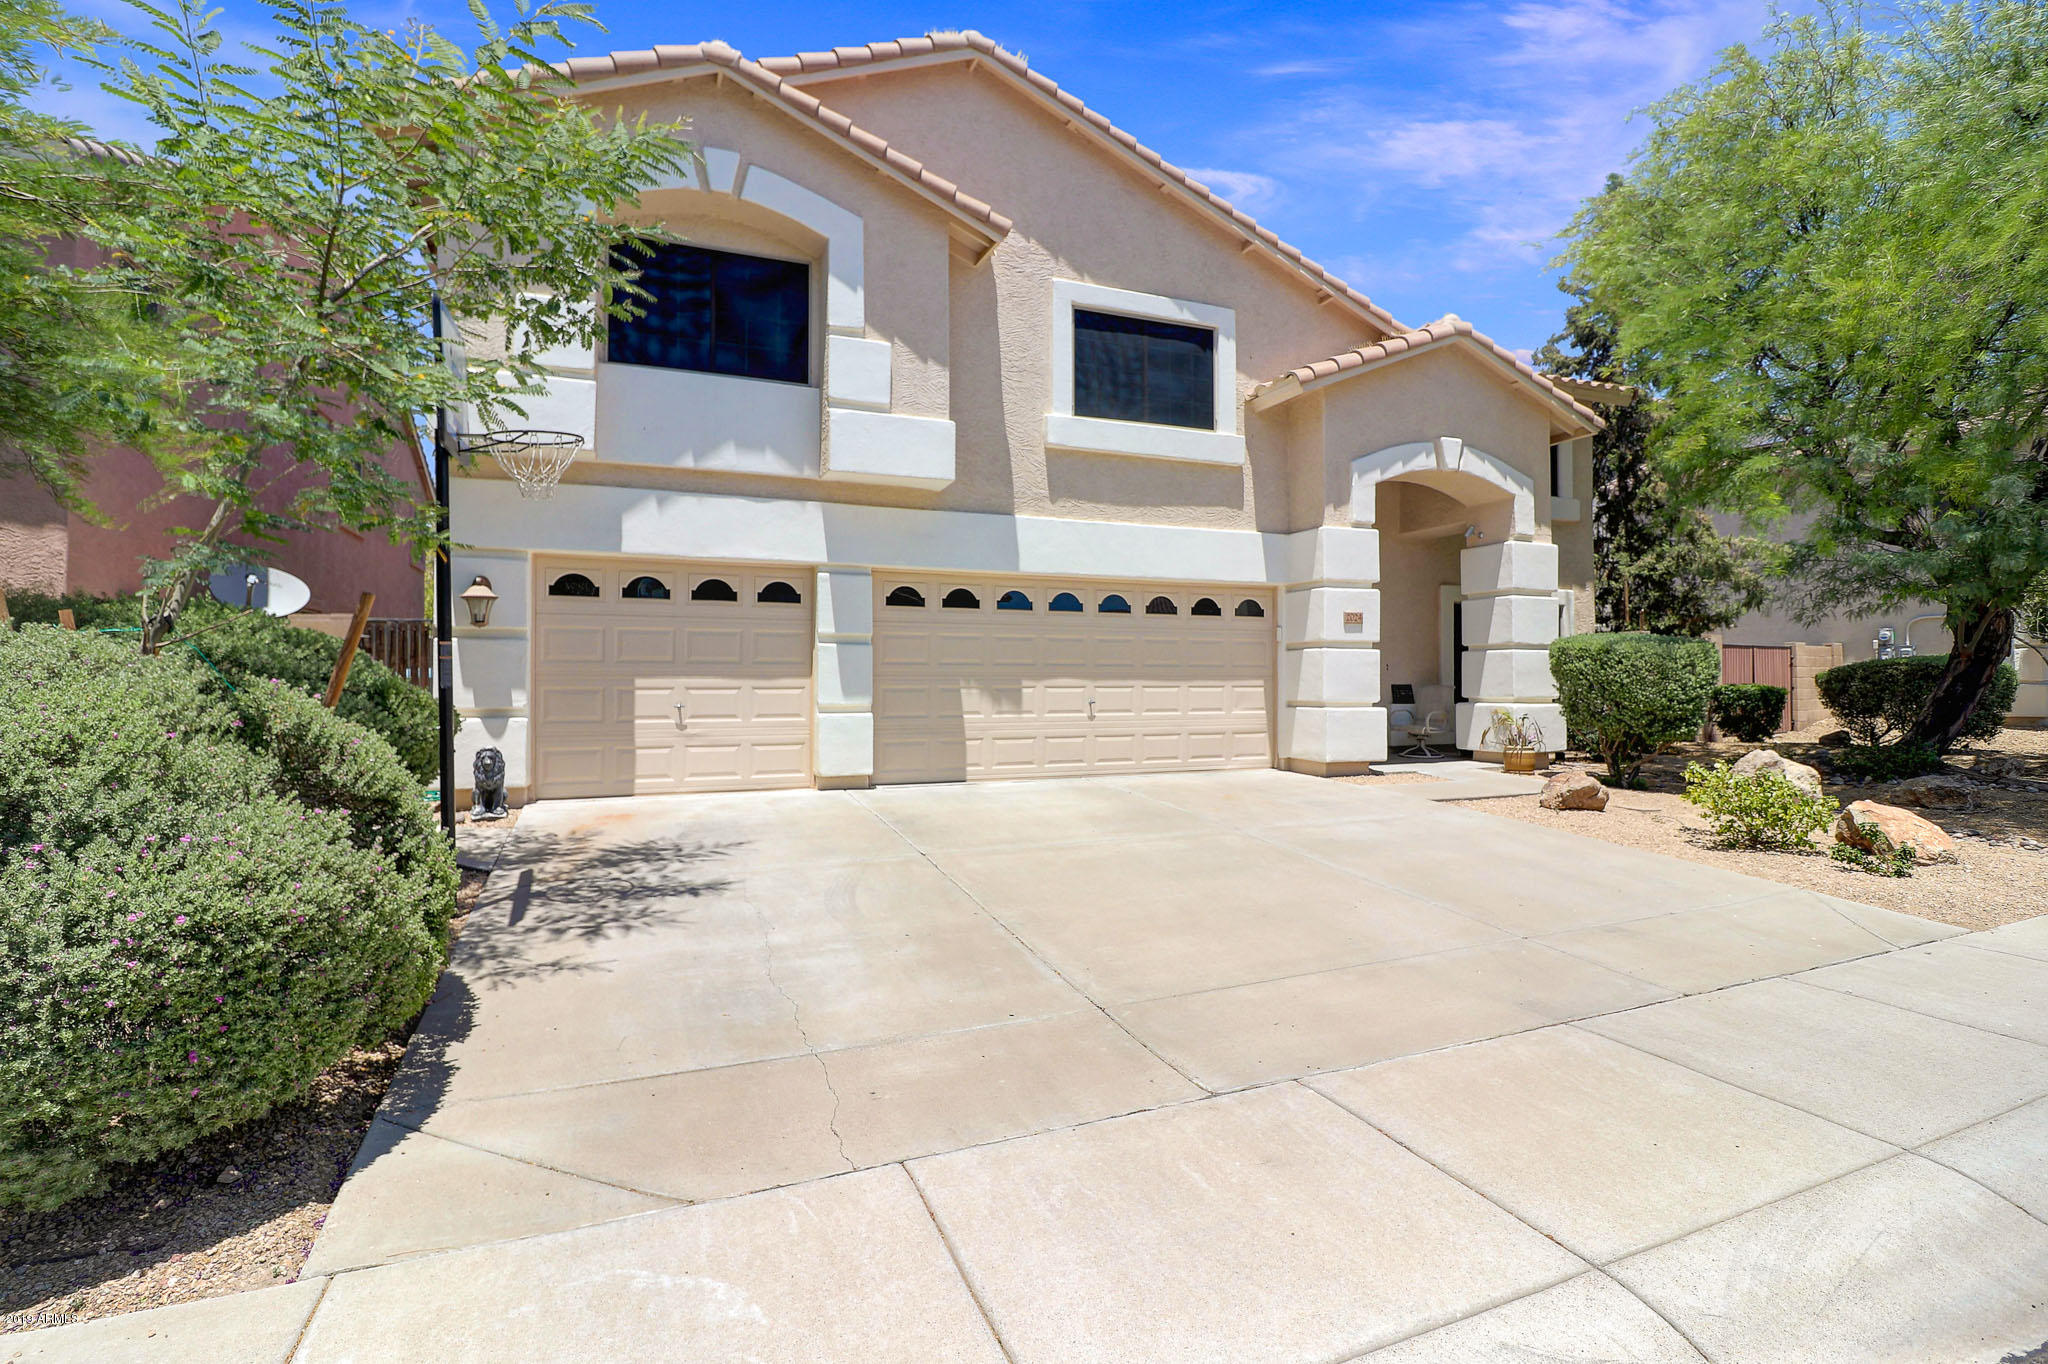 MLS 5938730 2024 E SOFT WIND Drive, Phoenix, AZ 85024 Phoenix AZ Mountaingate